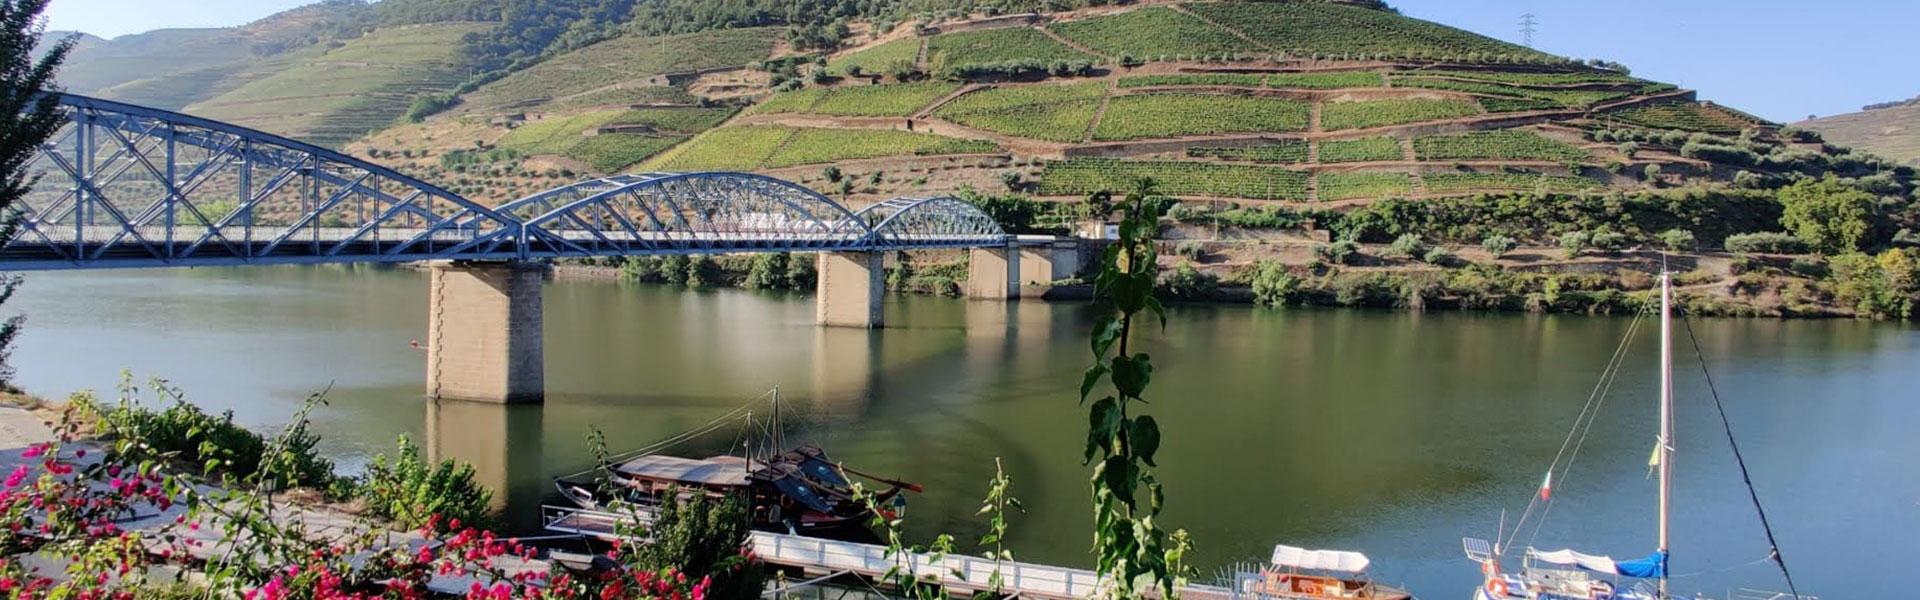 Bridge Pinhao